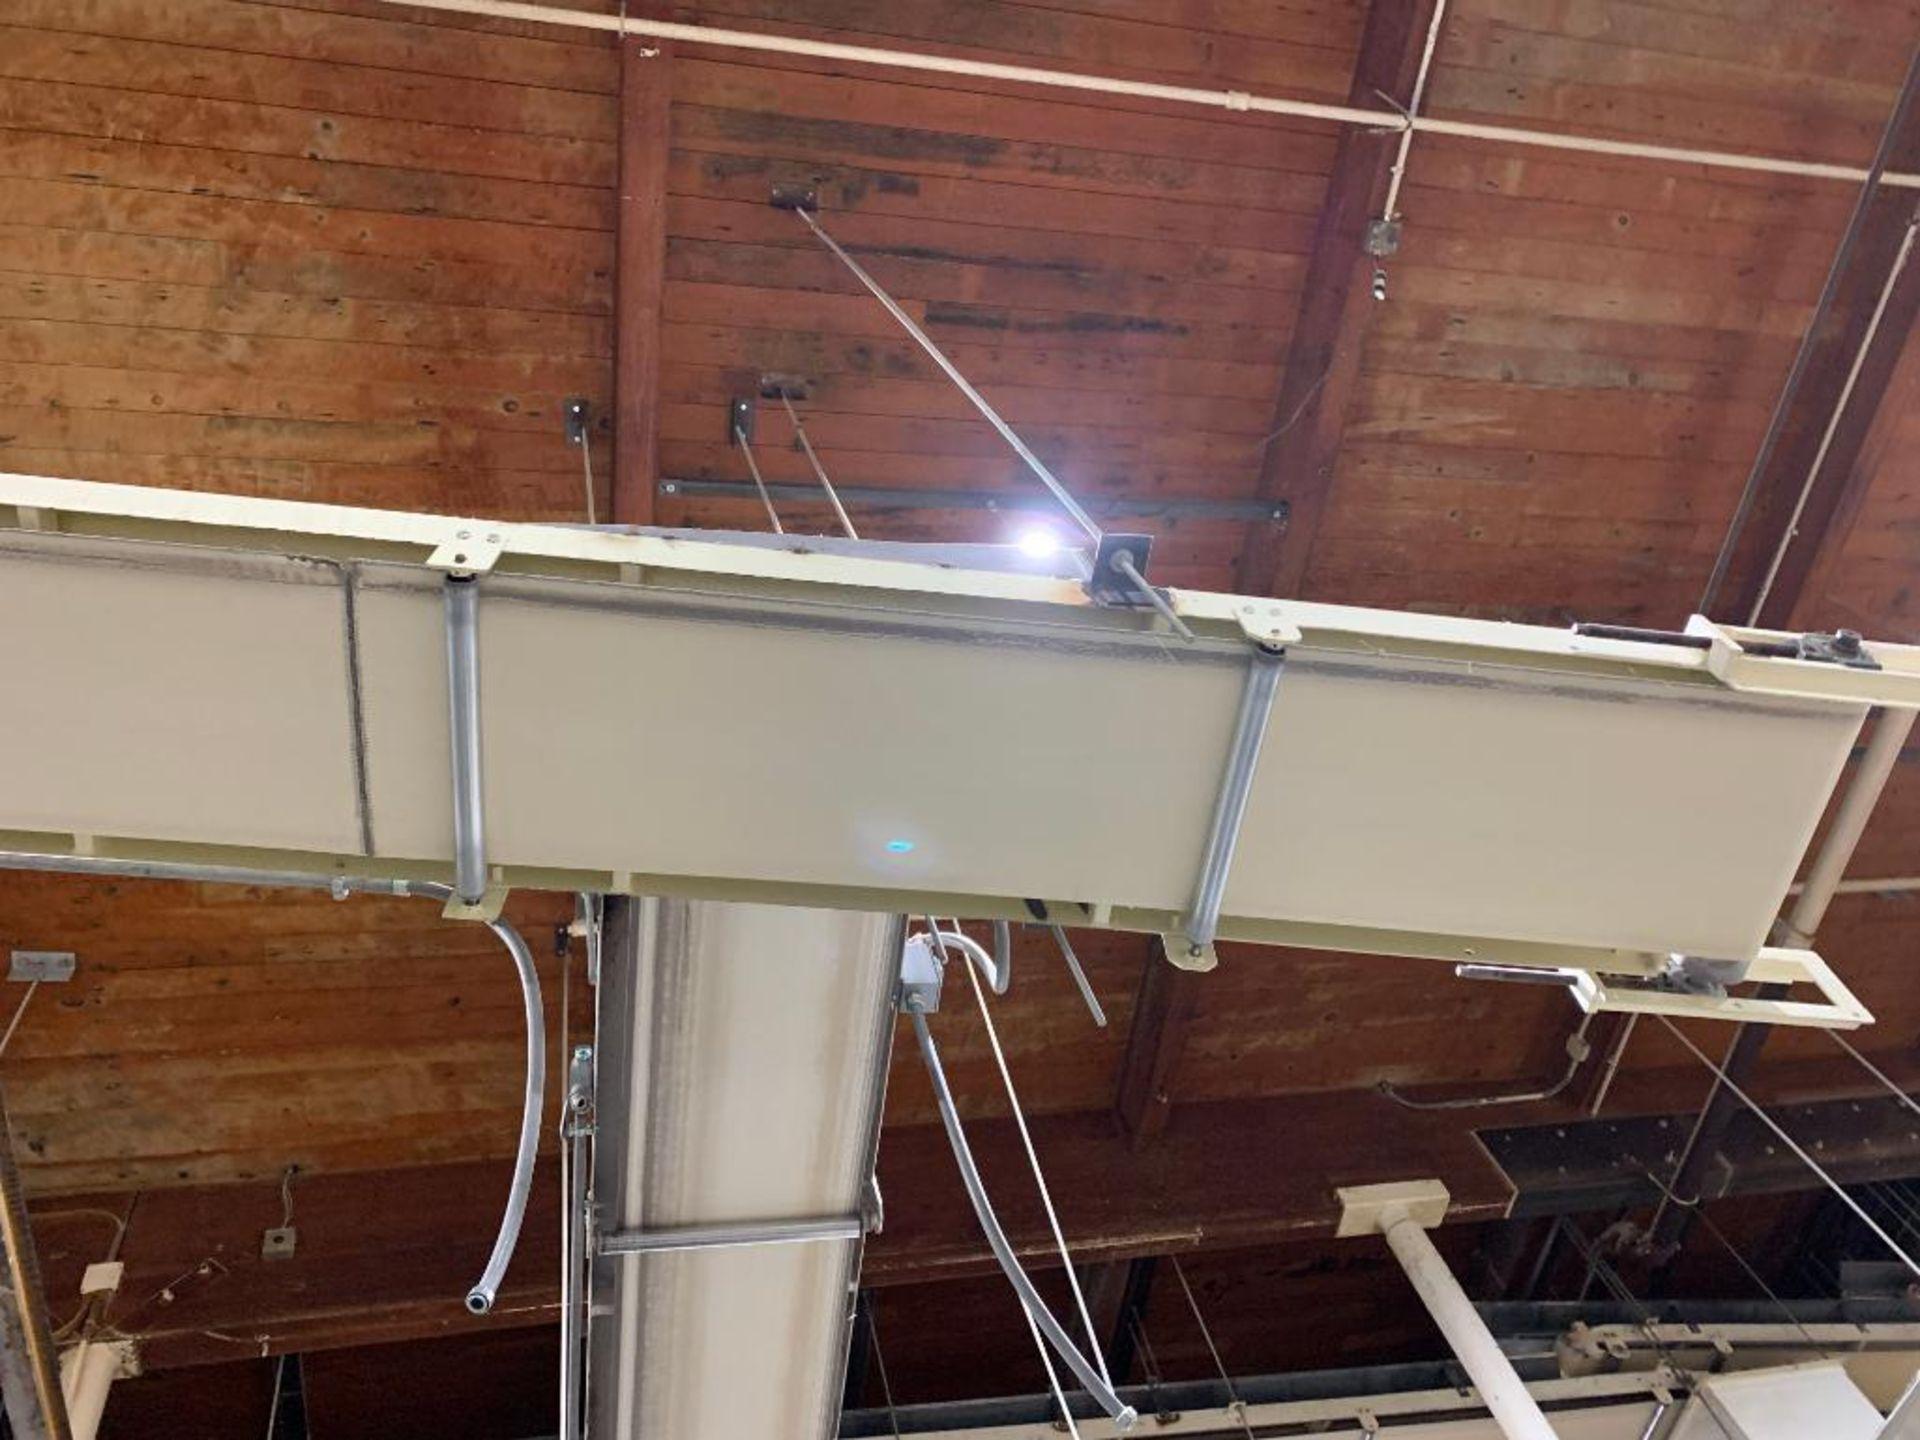 Aseeco mild steel decline conveyor - Image 10 of 12